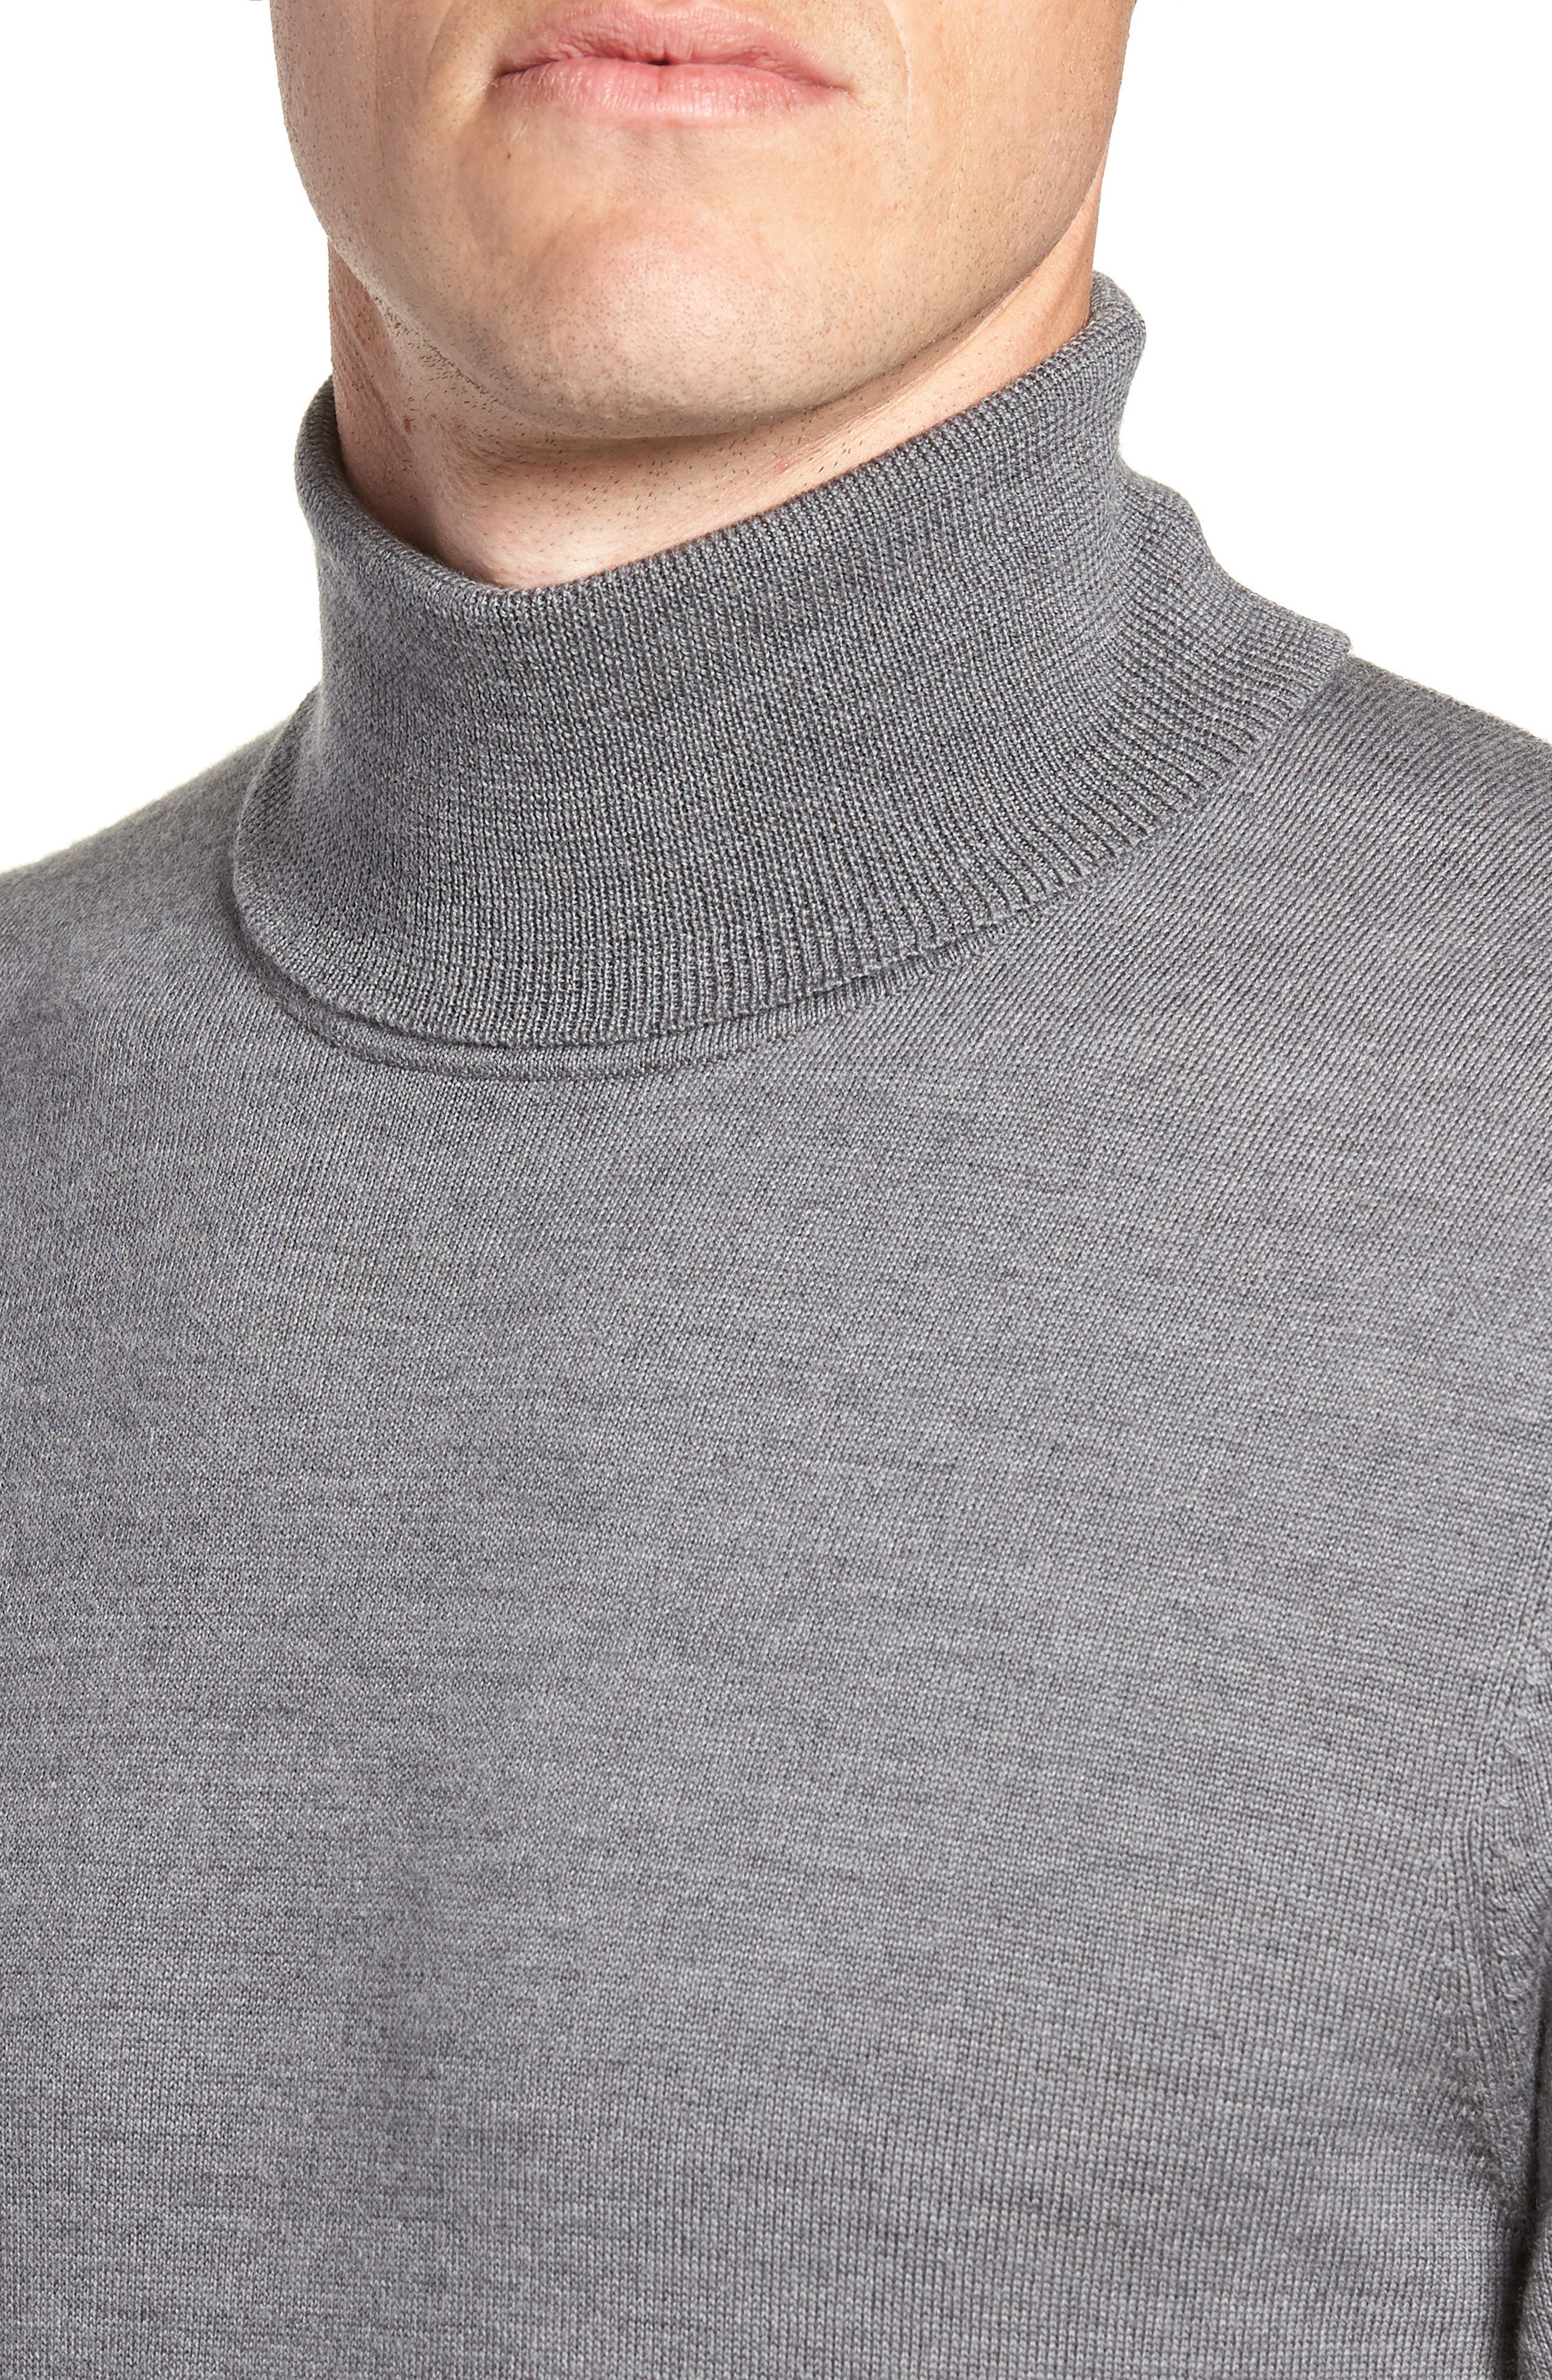 Merino Wool Turtleneck Sweater,                             Alternate thumbnail 20, color,